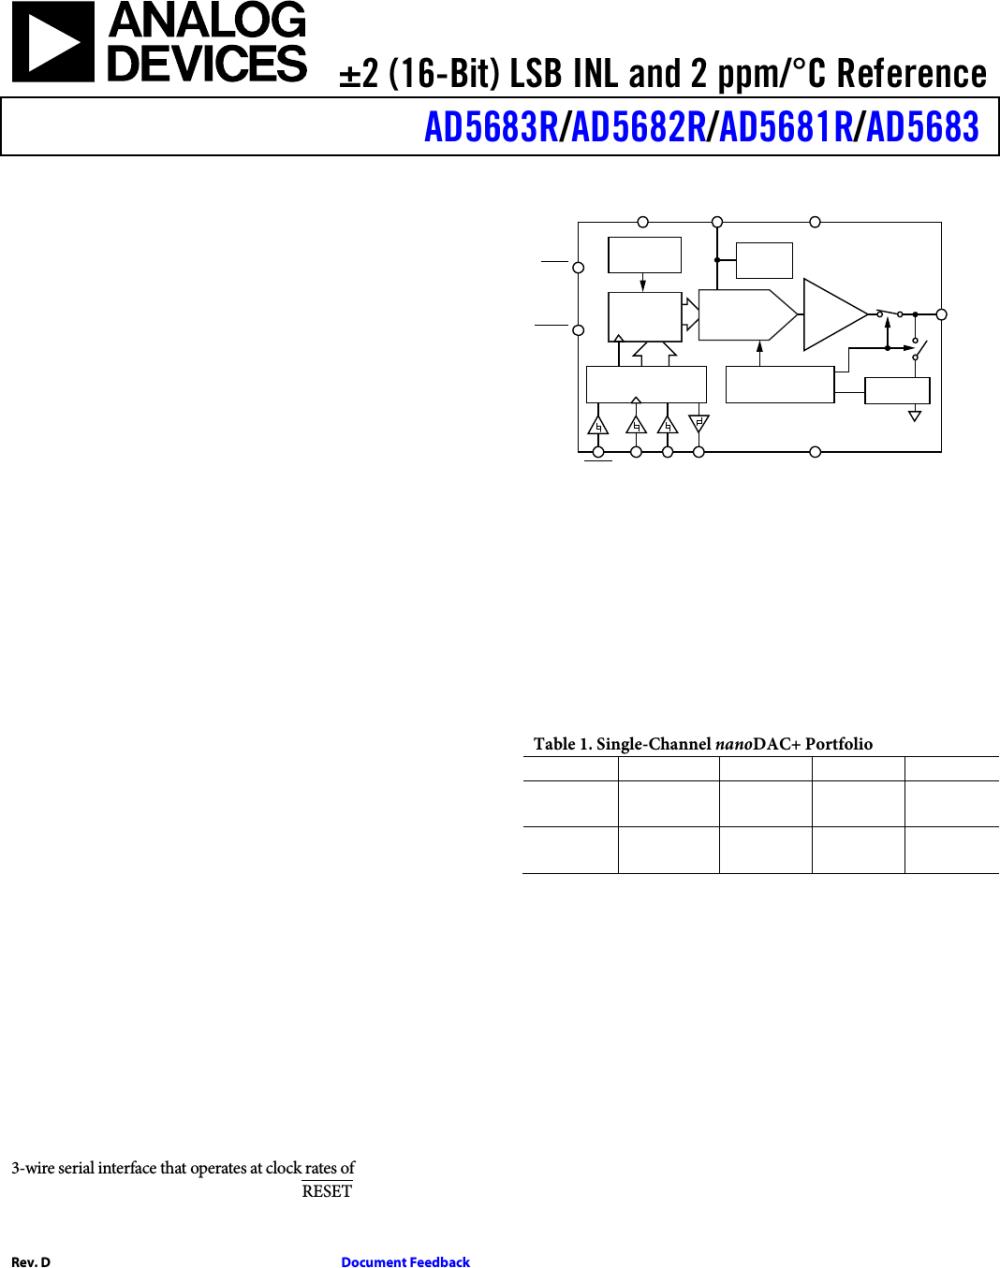 medium resolution of ad5681r 83r ad5683 datasheet analog devices digikey datasheet db8 phone cord wiring diagram